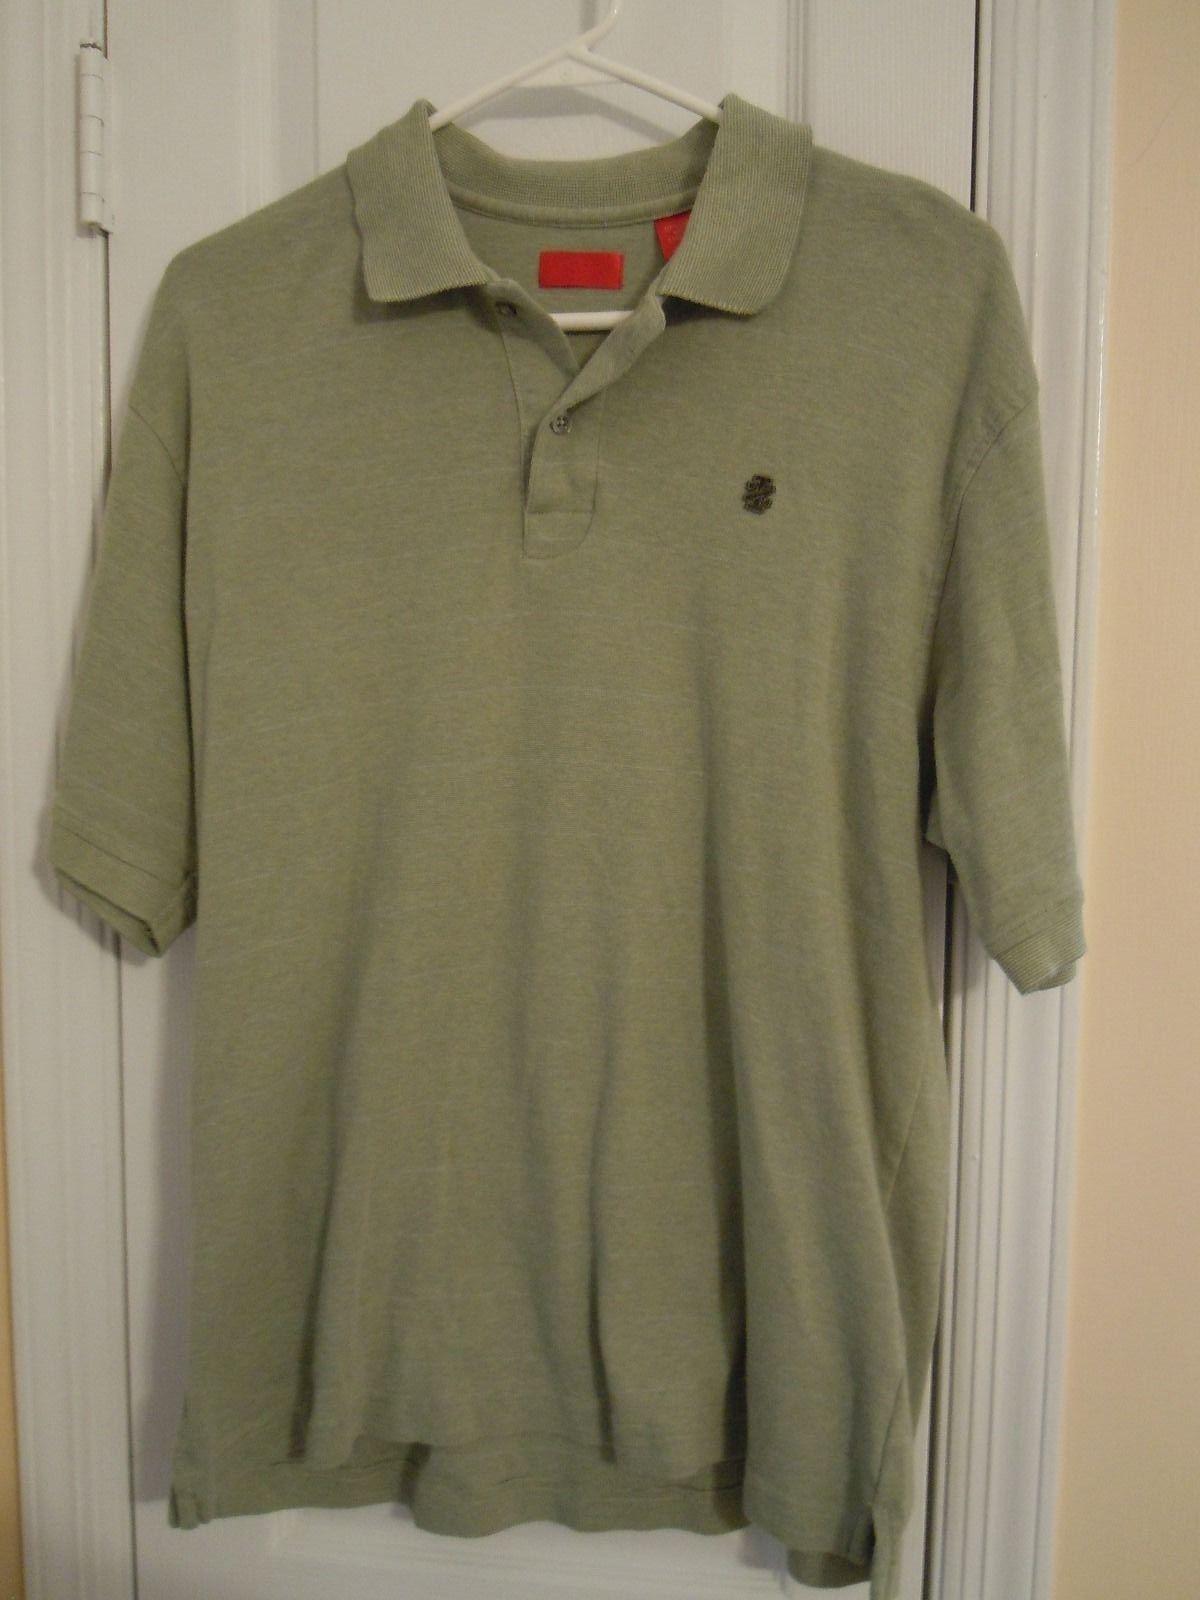 783c2287 Izod Pima Cotton Polo Shirt | RLDM